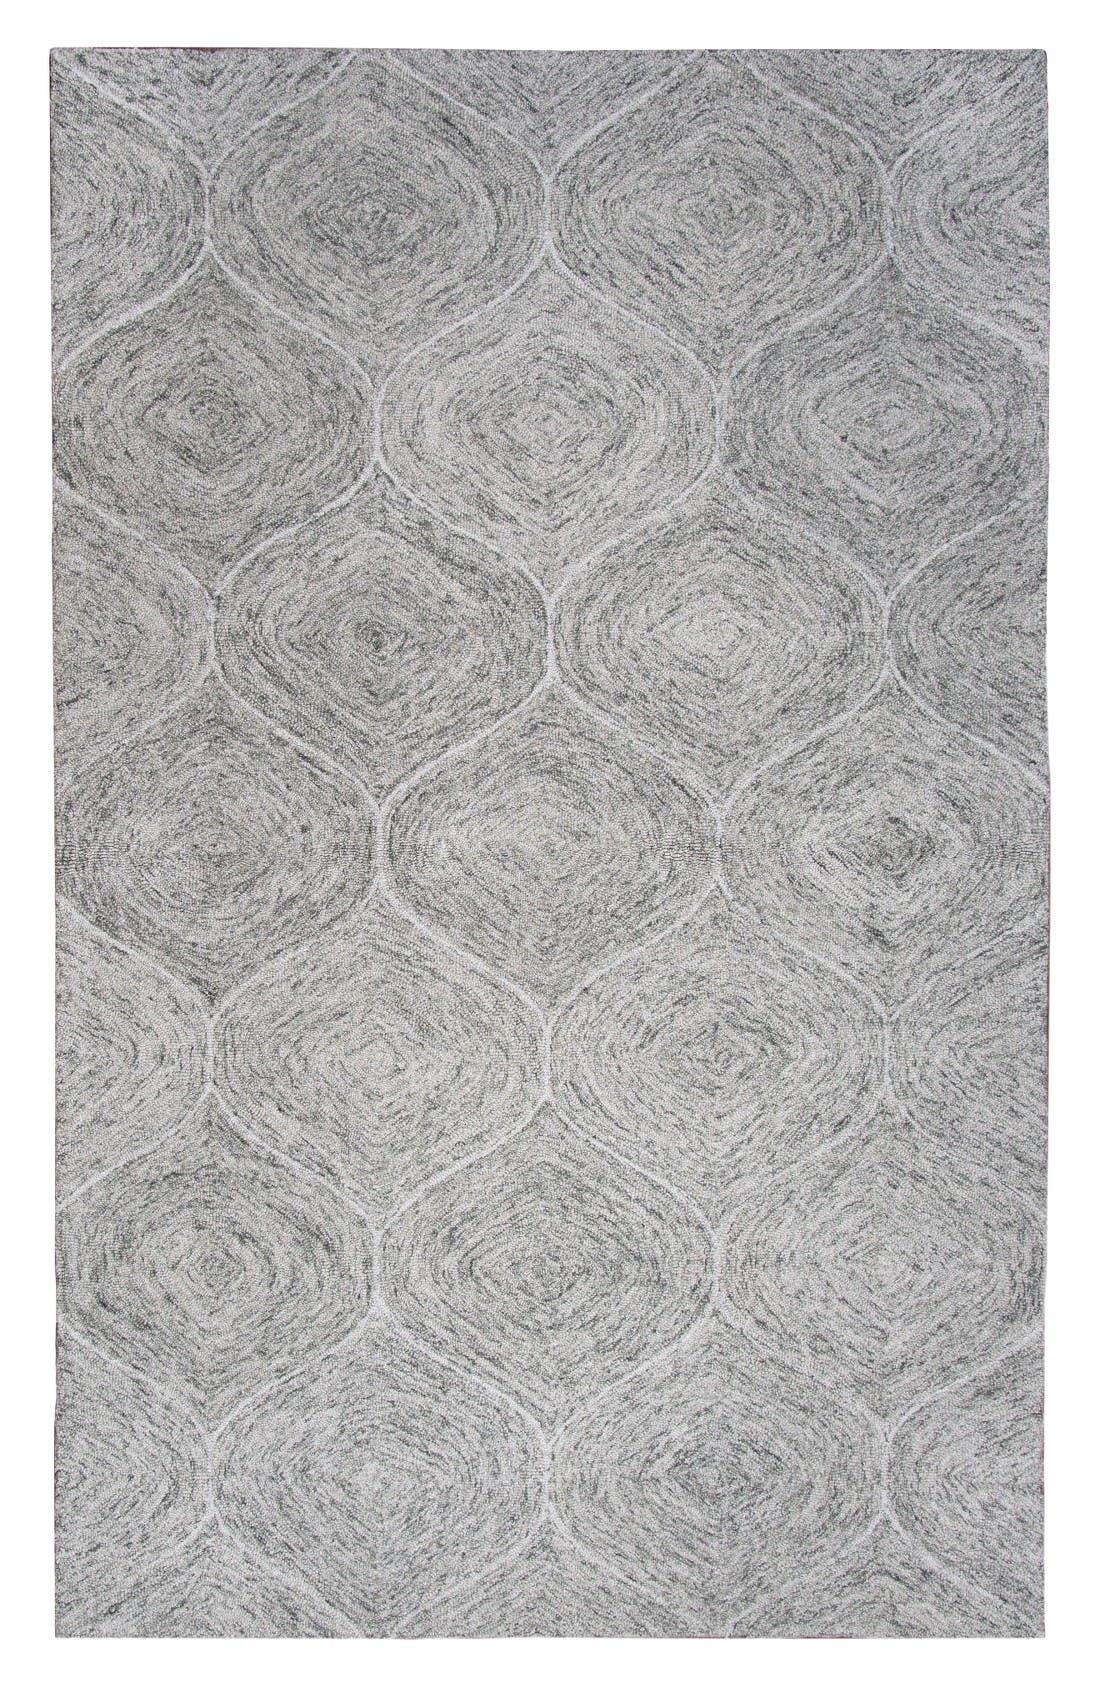 Irregular Diamond Hand Tufted Wool Area Rug,                         Main,                         color, Grey